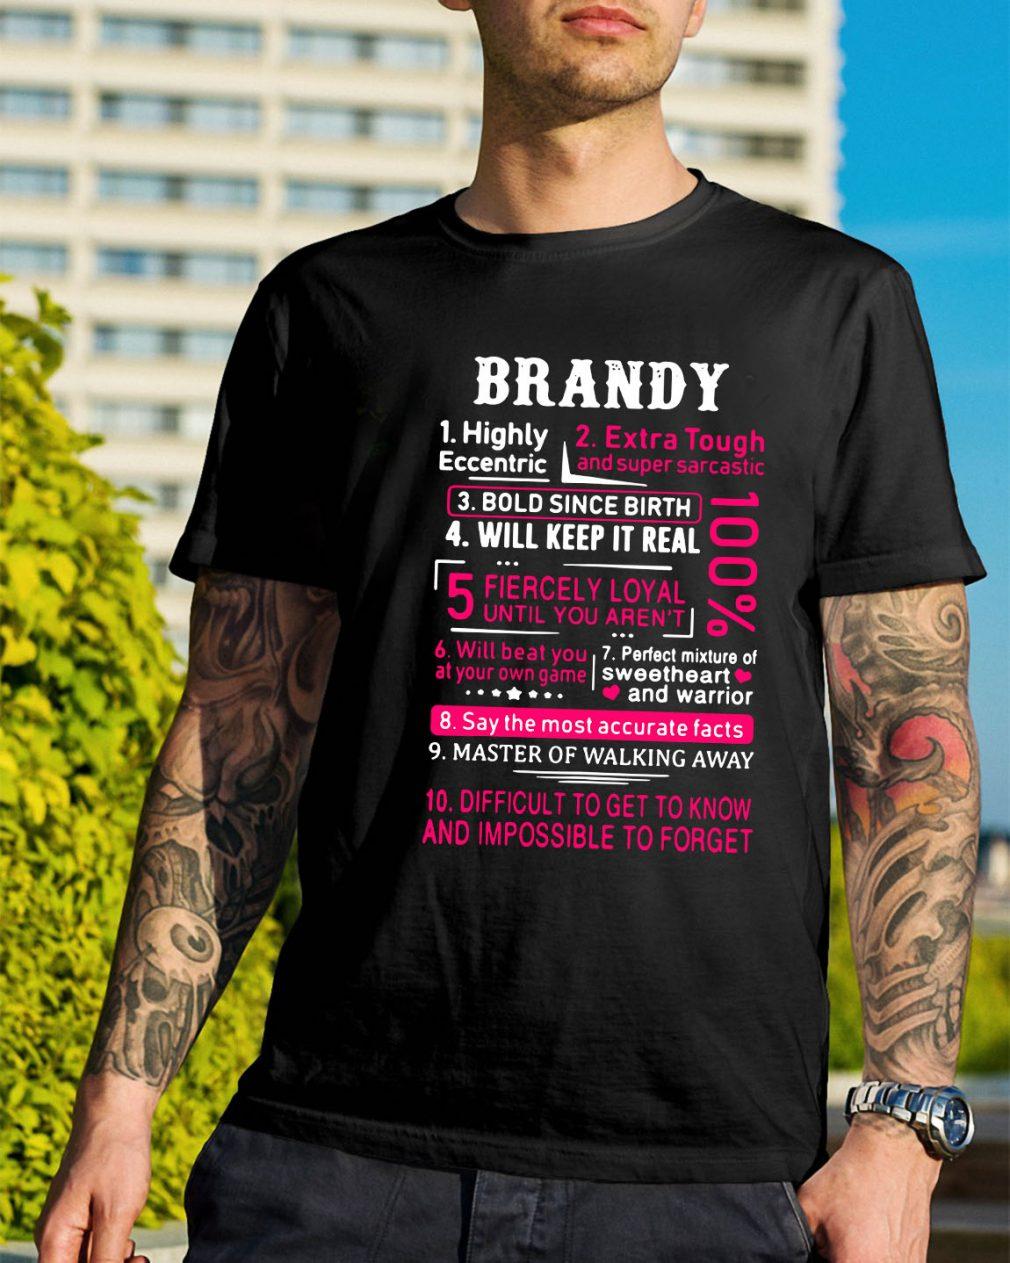 Brandy highly eccentric extra tough and super sarcastic shirt